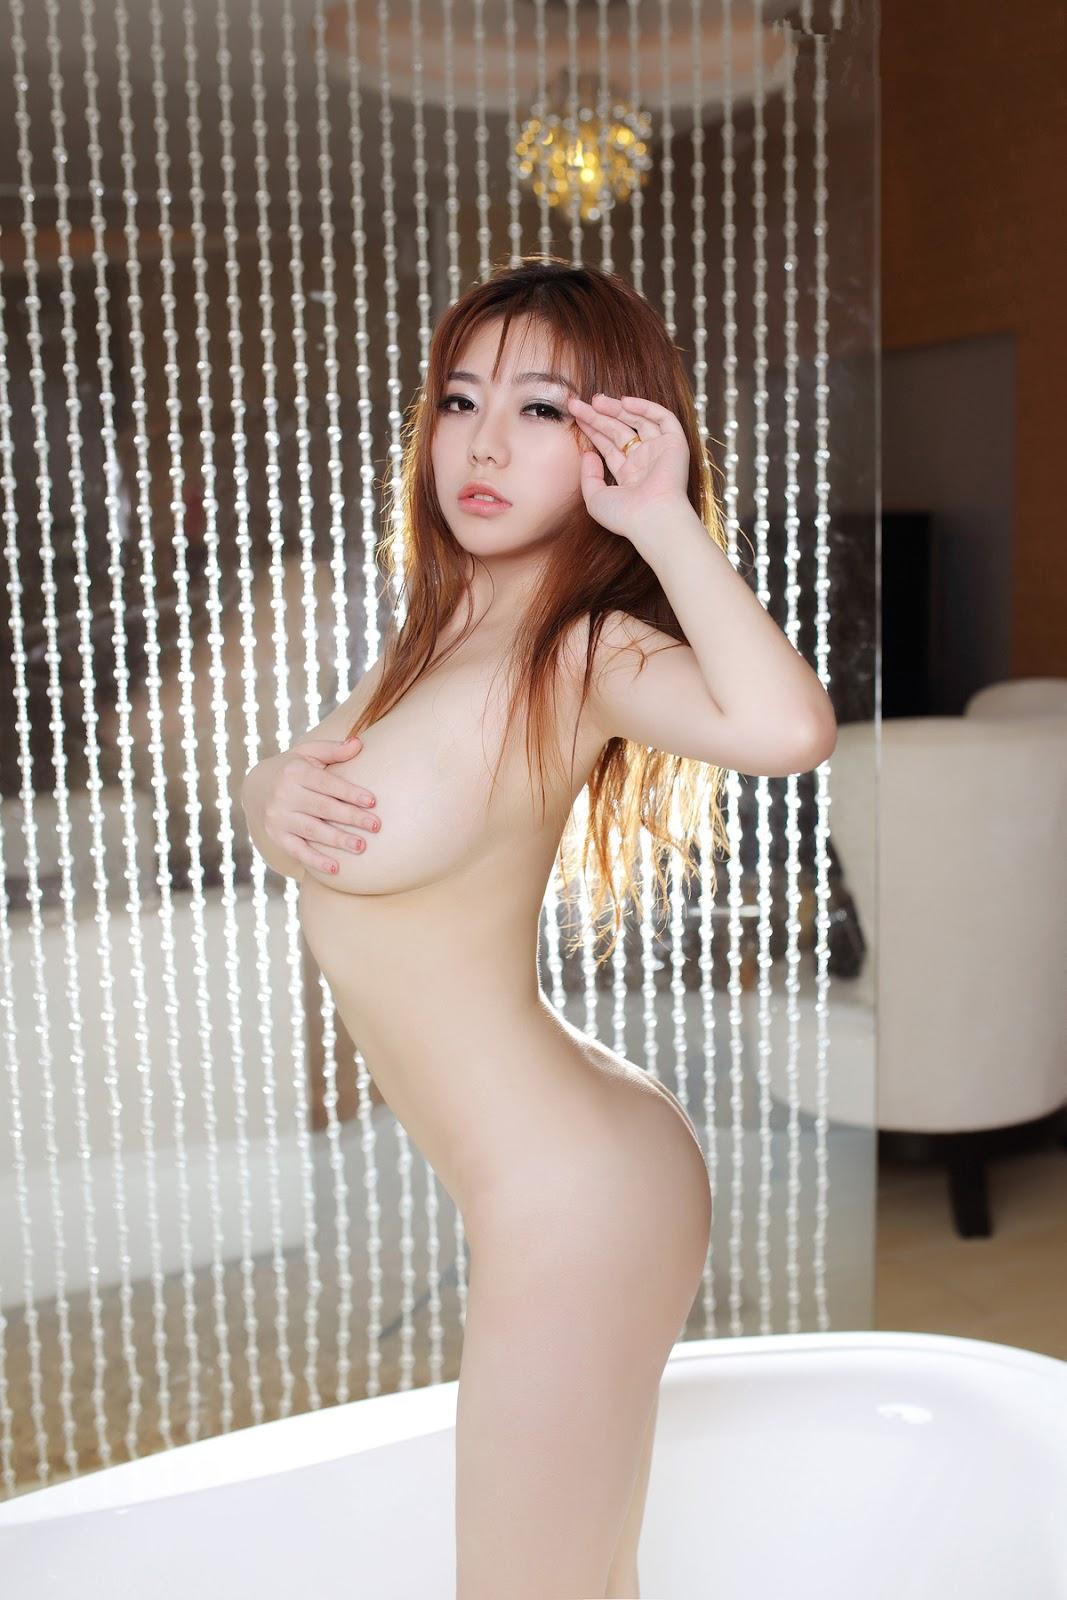 %2529%252B%252B%25C2%25A6%25C2%25B7 17 - TGOD Sexy Nude FAYE